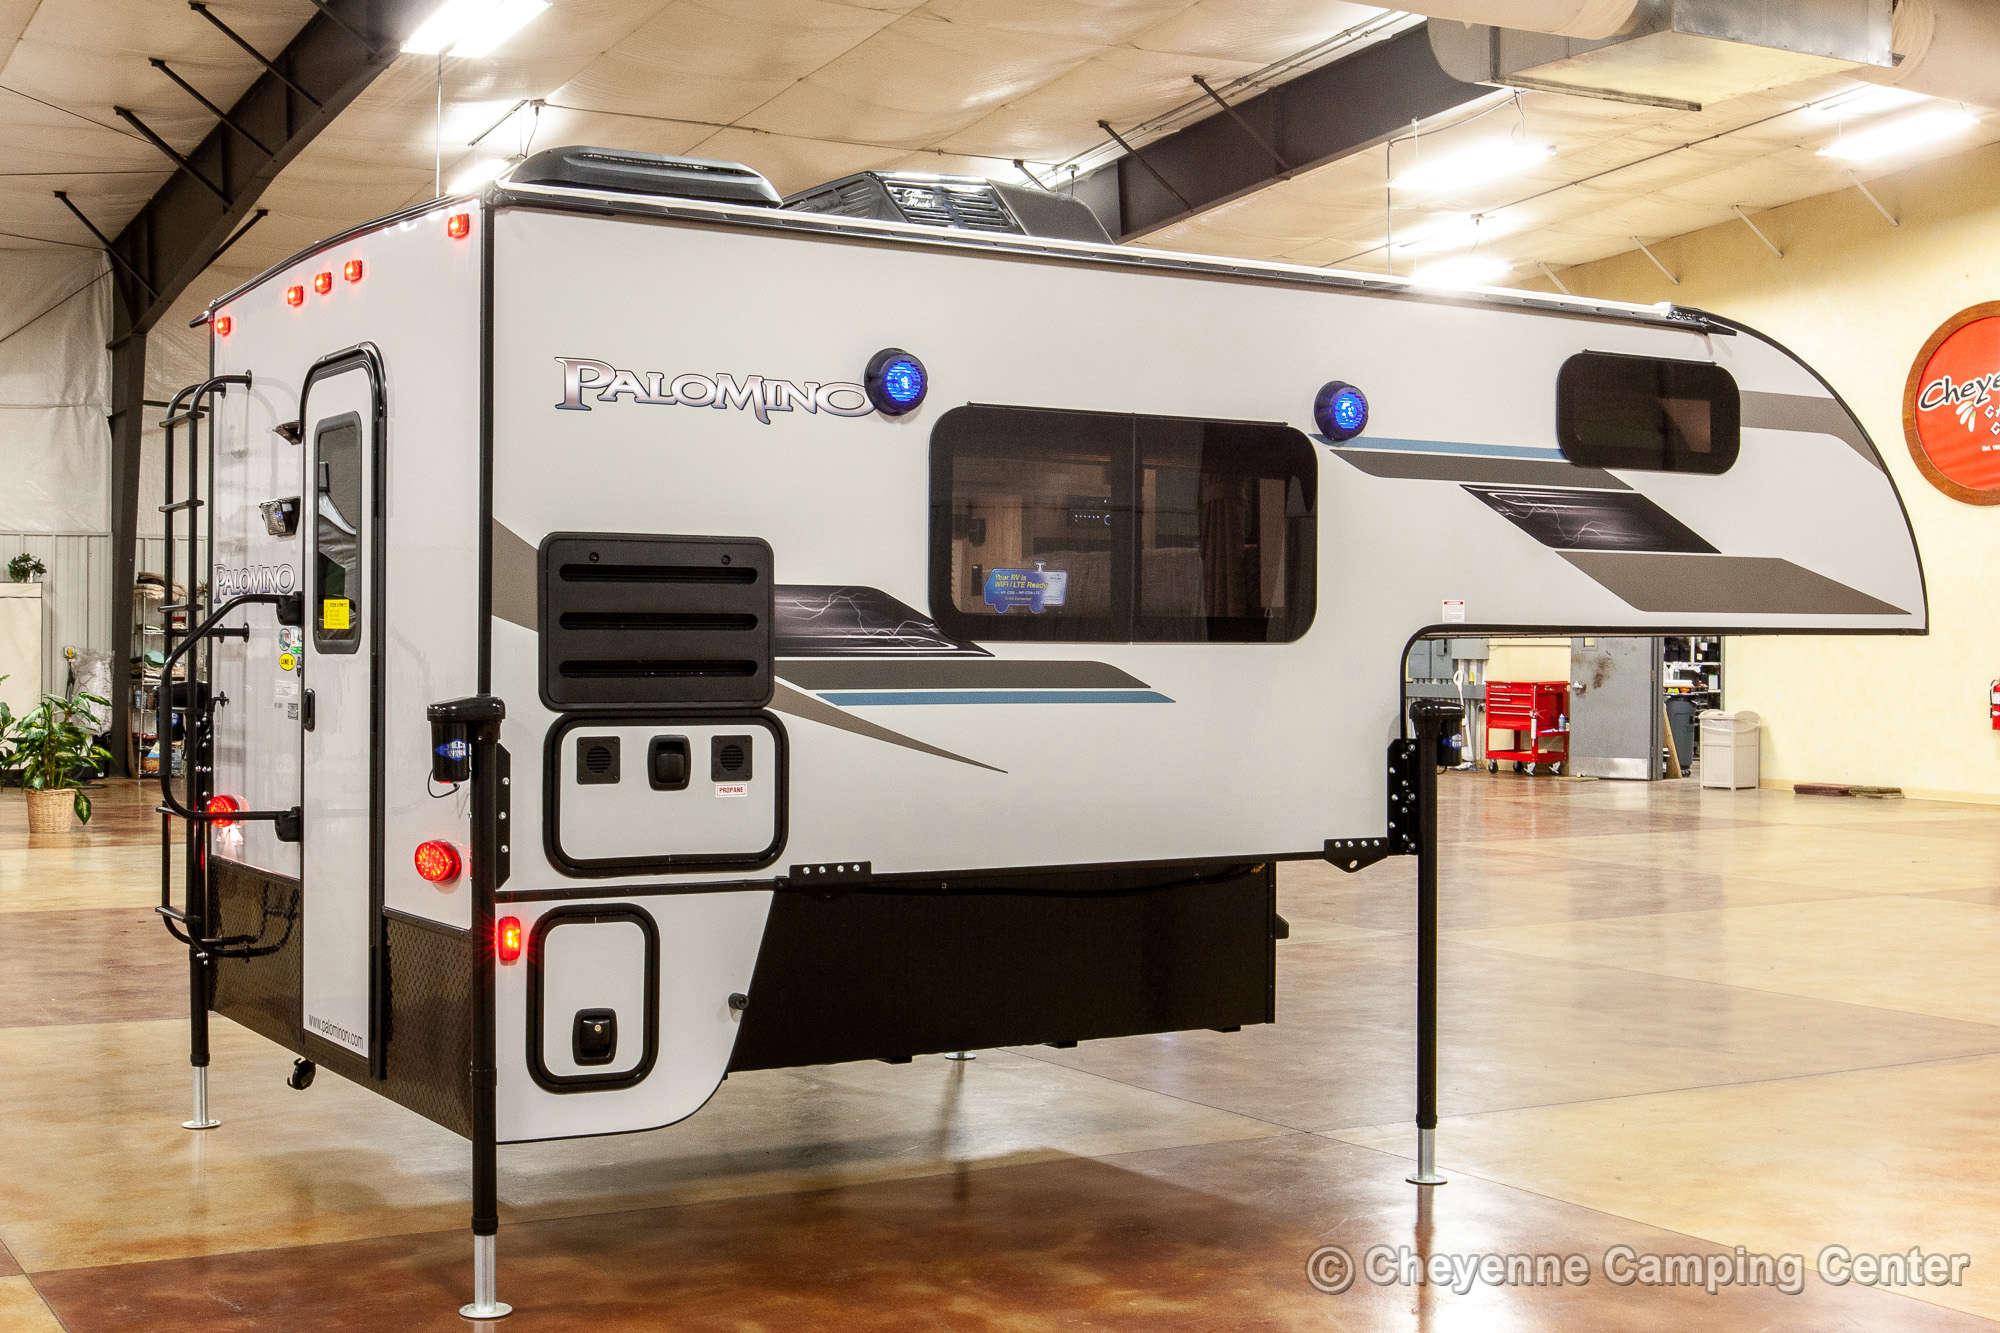 2021 Palomino BackPack HS-8801 Truck Camper Exterior Image